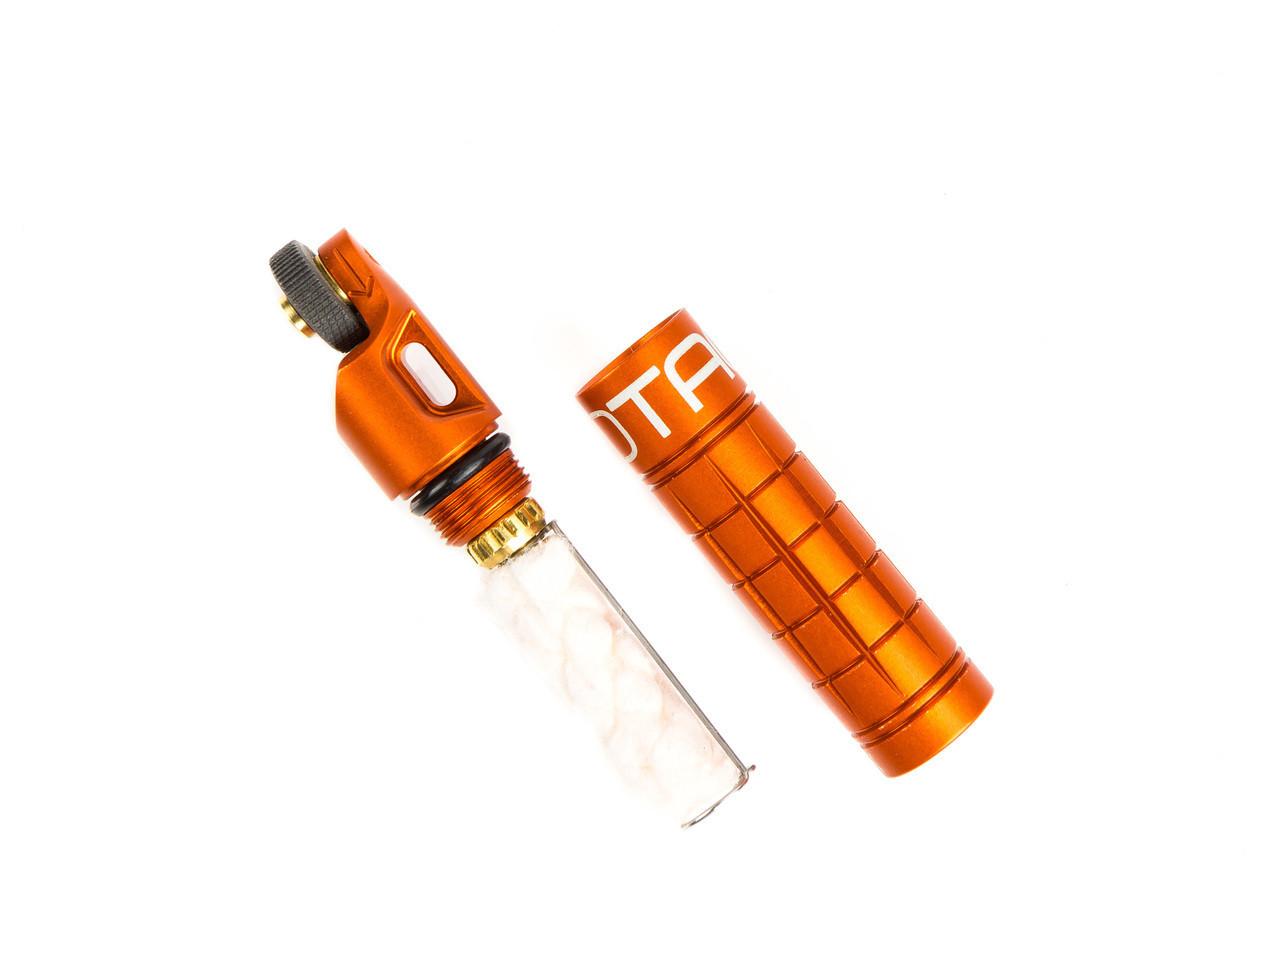 Exotac nanoSPARK Blaze Orange